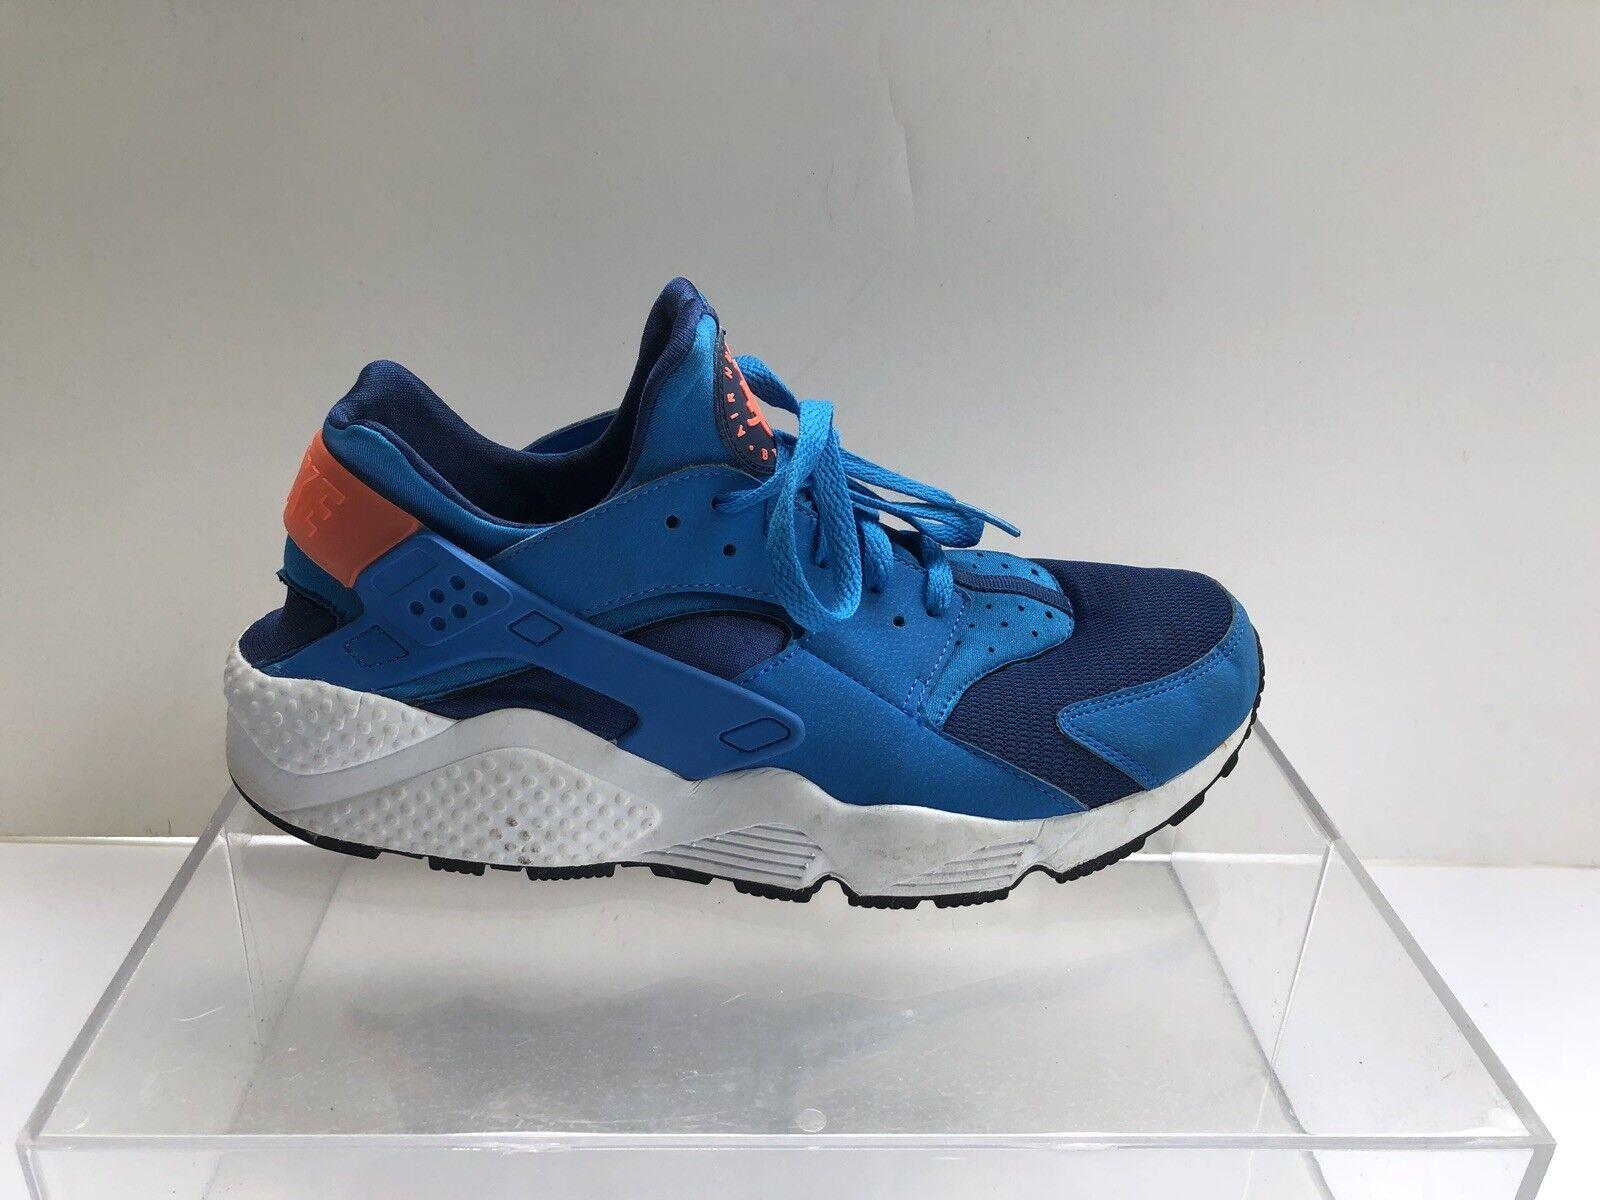 Size 10.5 Nike Uomo Air Huarache Ultra Shoes